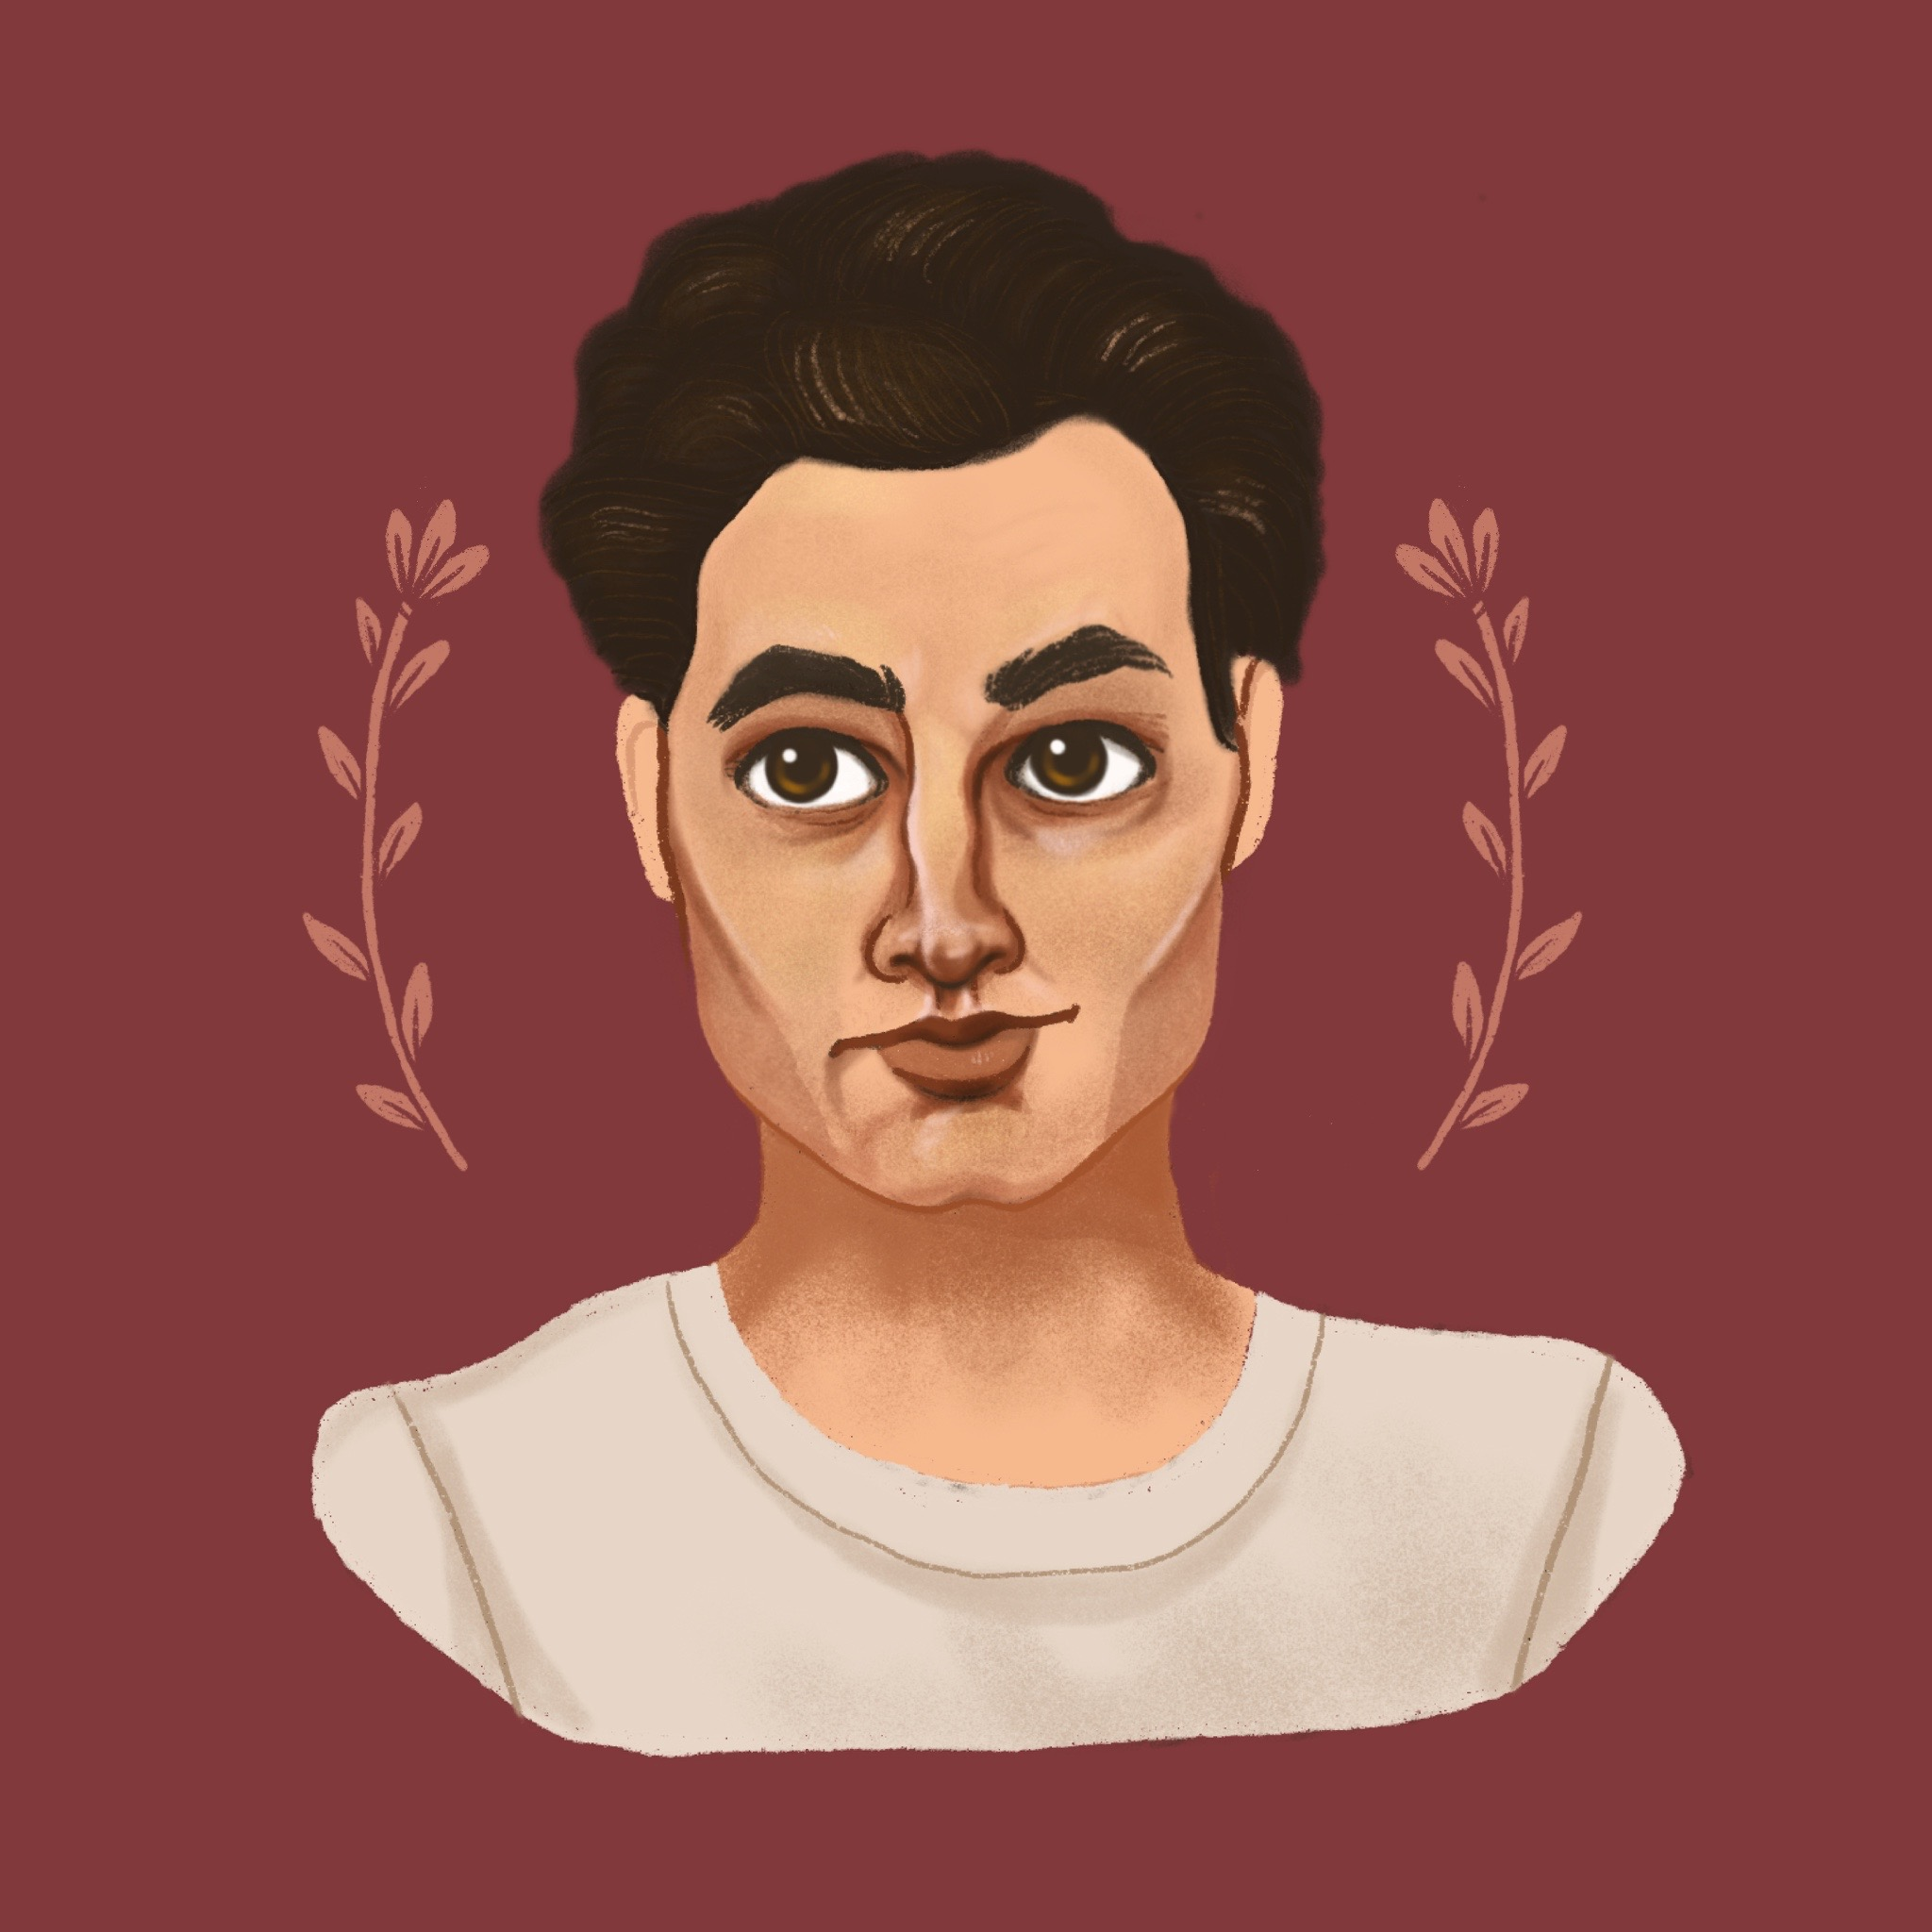 An illustration / portrait of Joe Goldberg from You on Netflix.